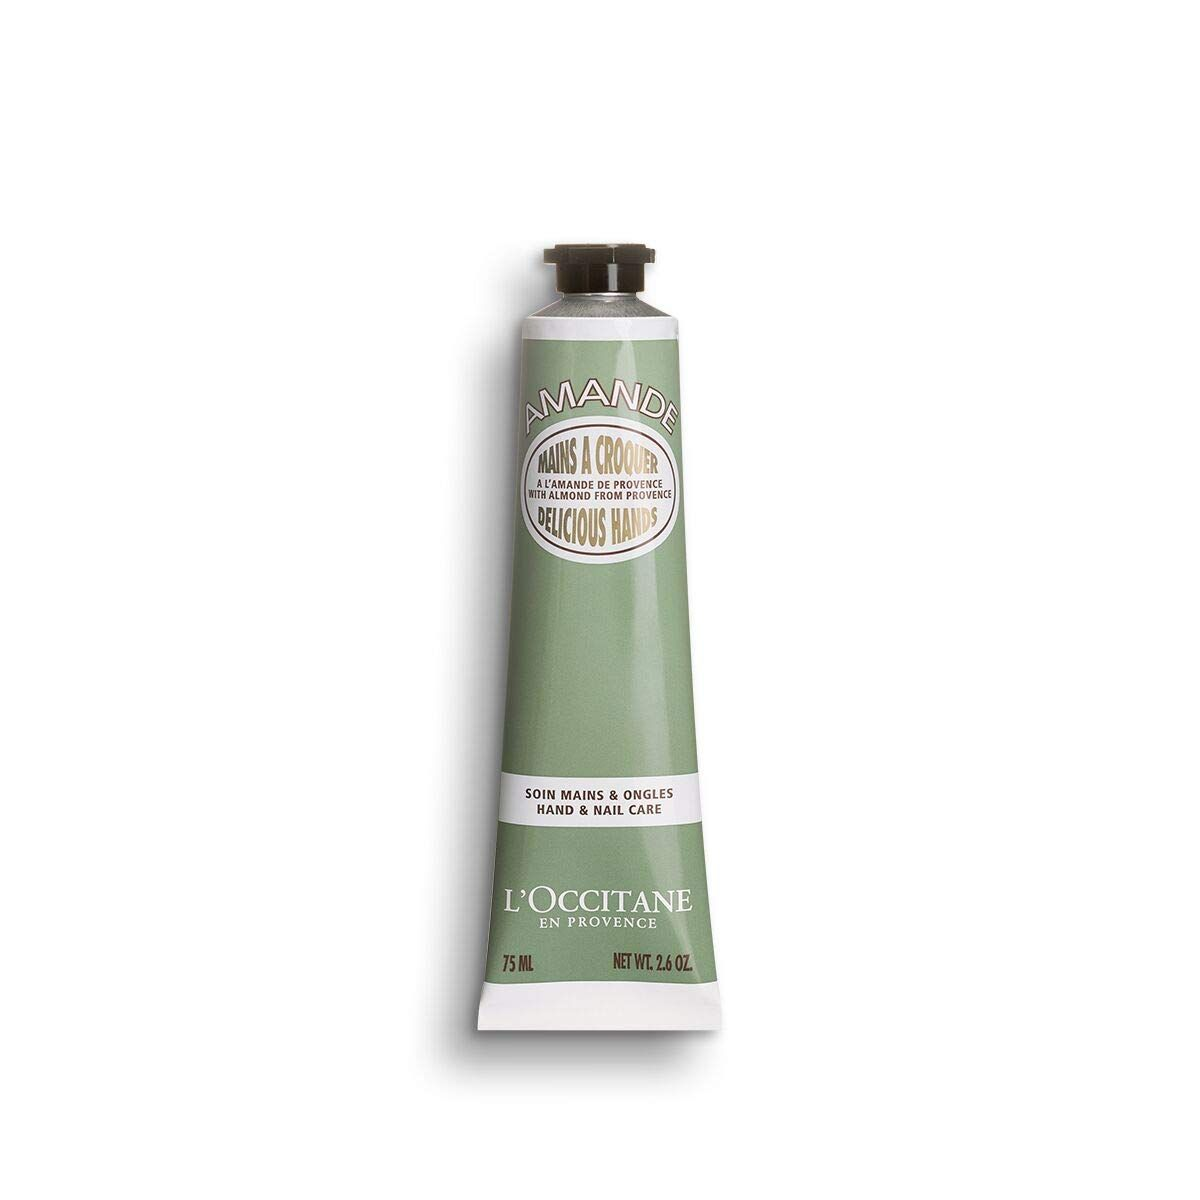 Jergens Extra Moisturizing Liquid Hand Soap 7 5 Oz Bottles